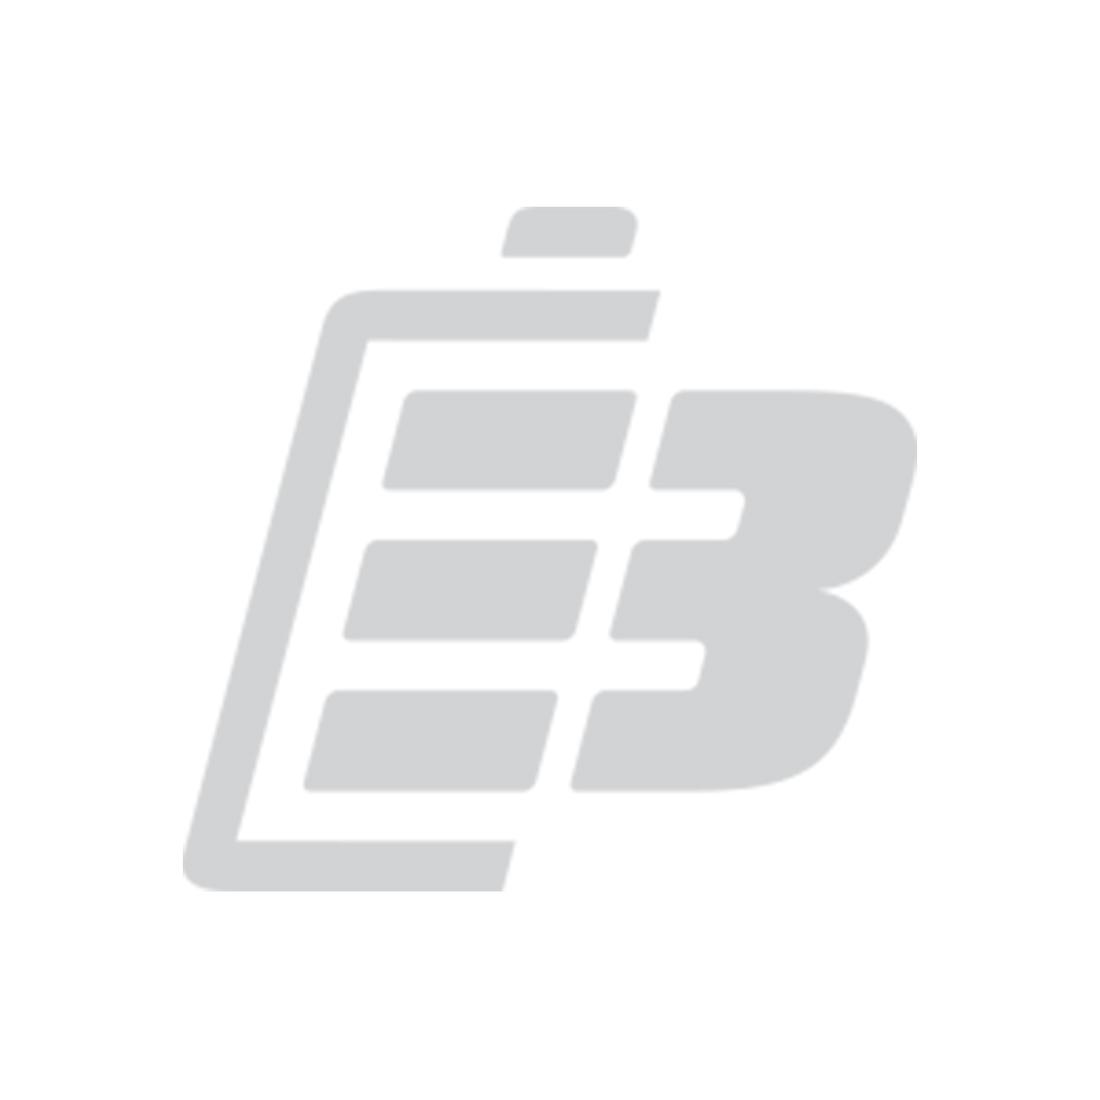 Cordless phone battery Incom ICW-1000B_1